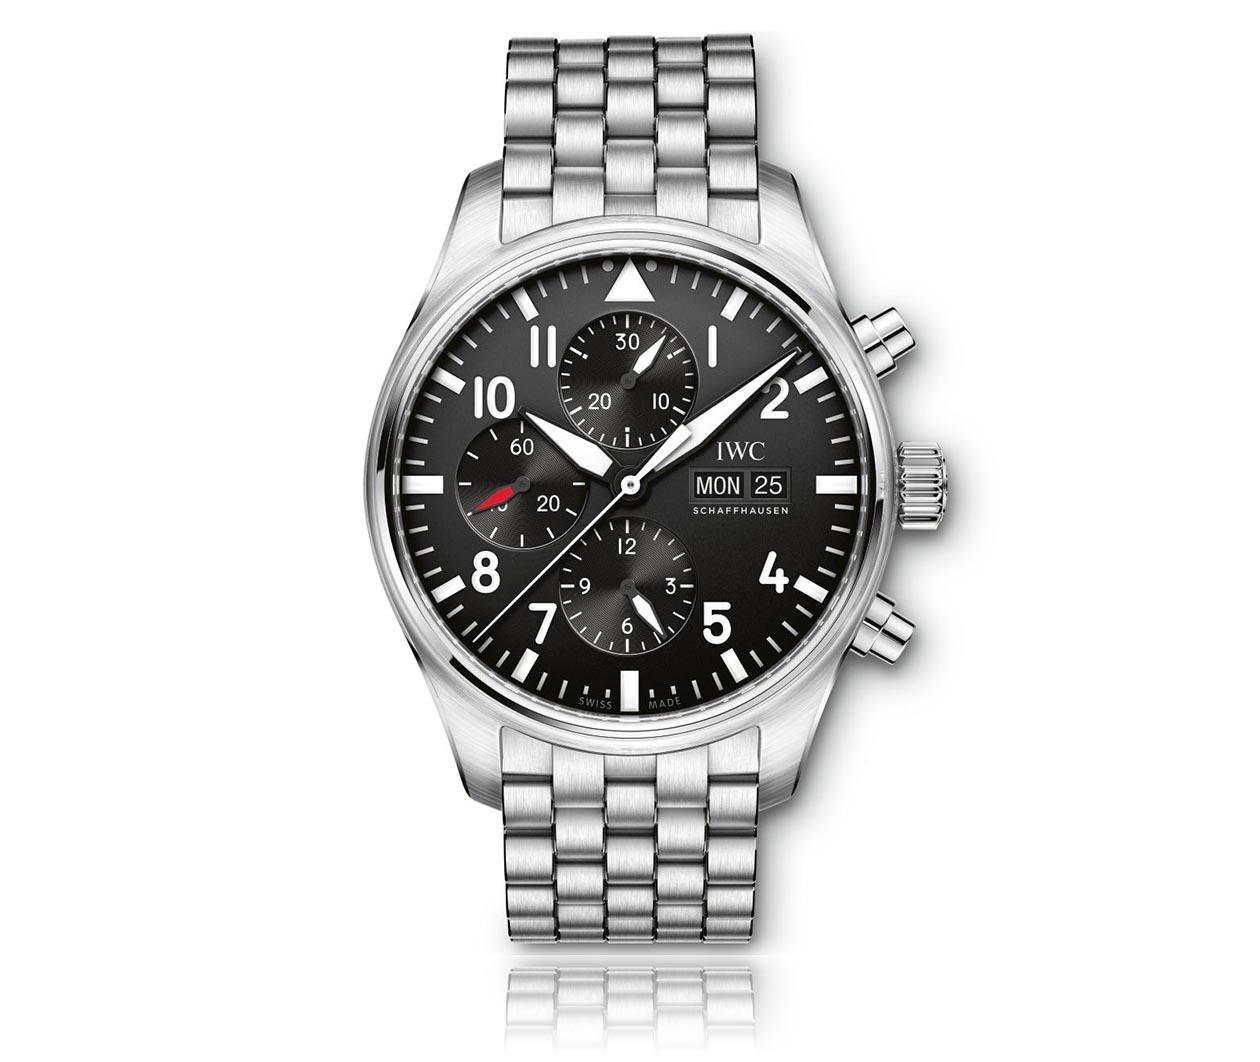 IWC PilotsWatch Chronograph IW377710 Carousel 1 FINAL